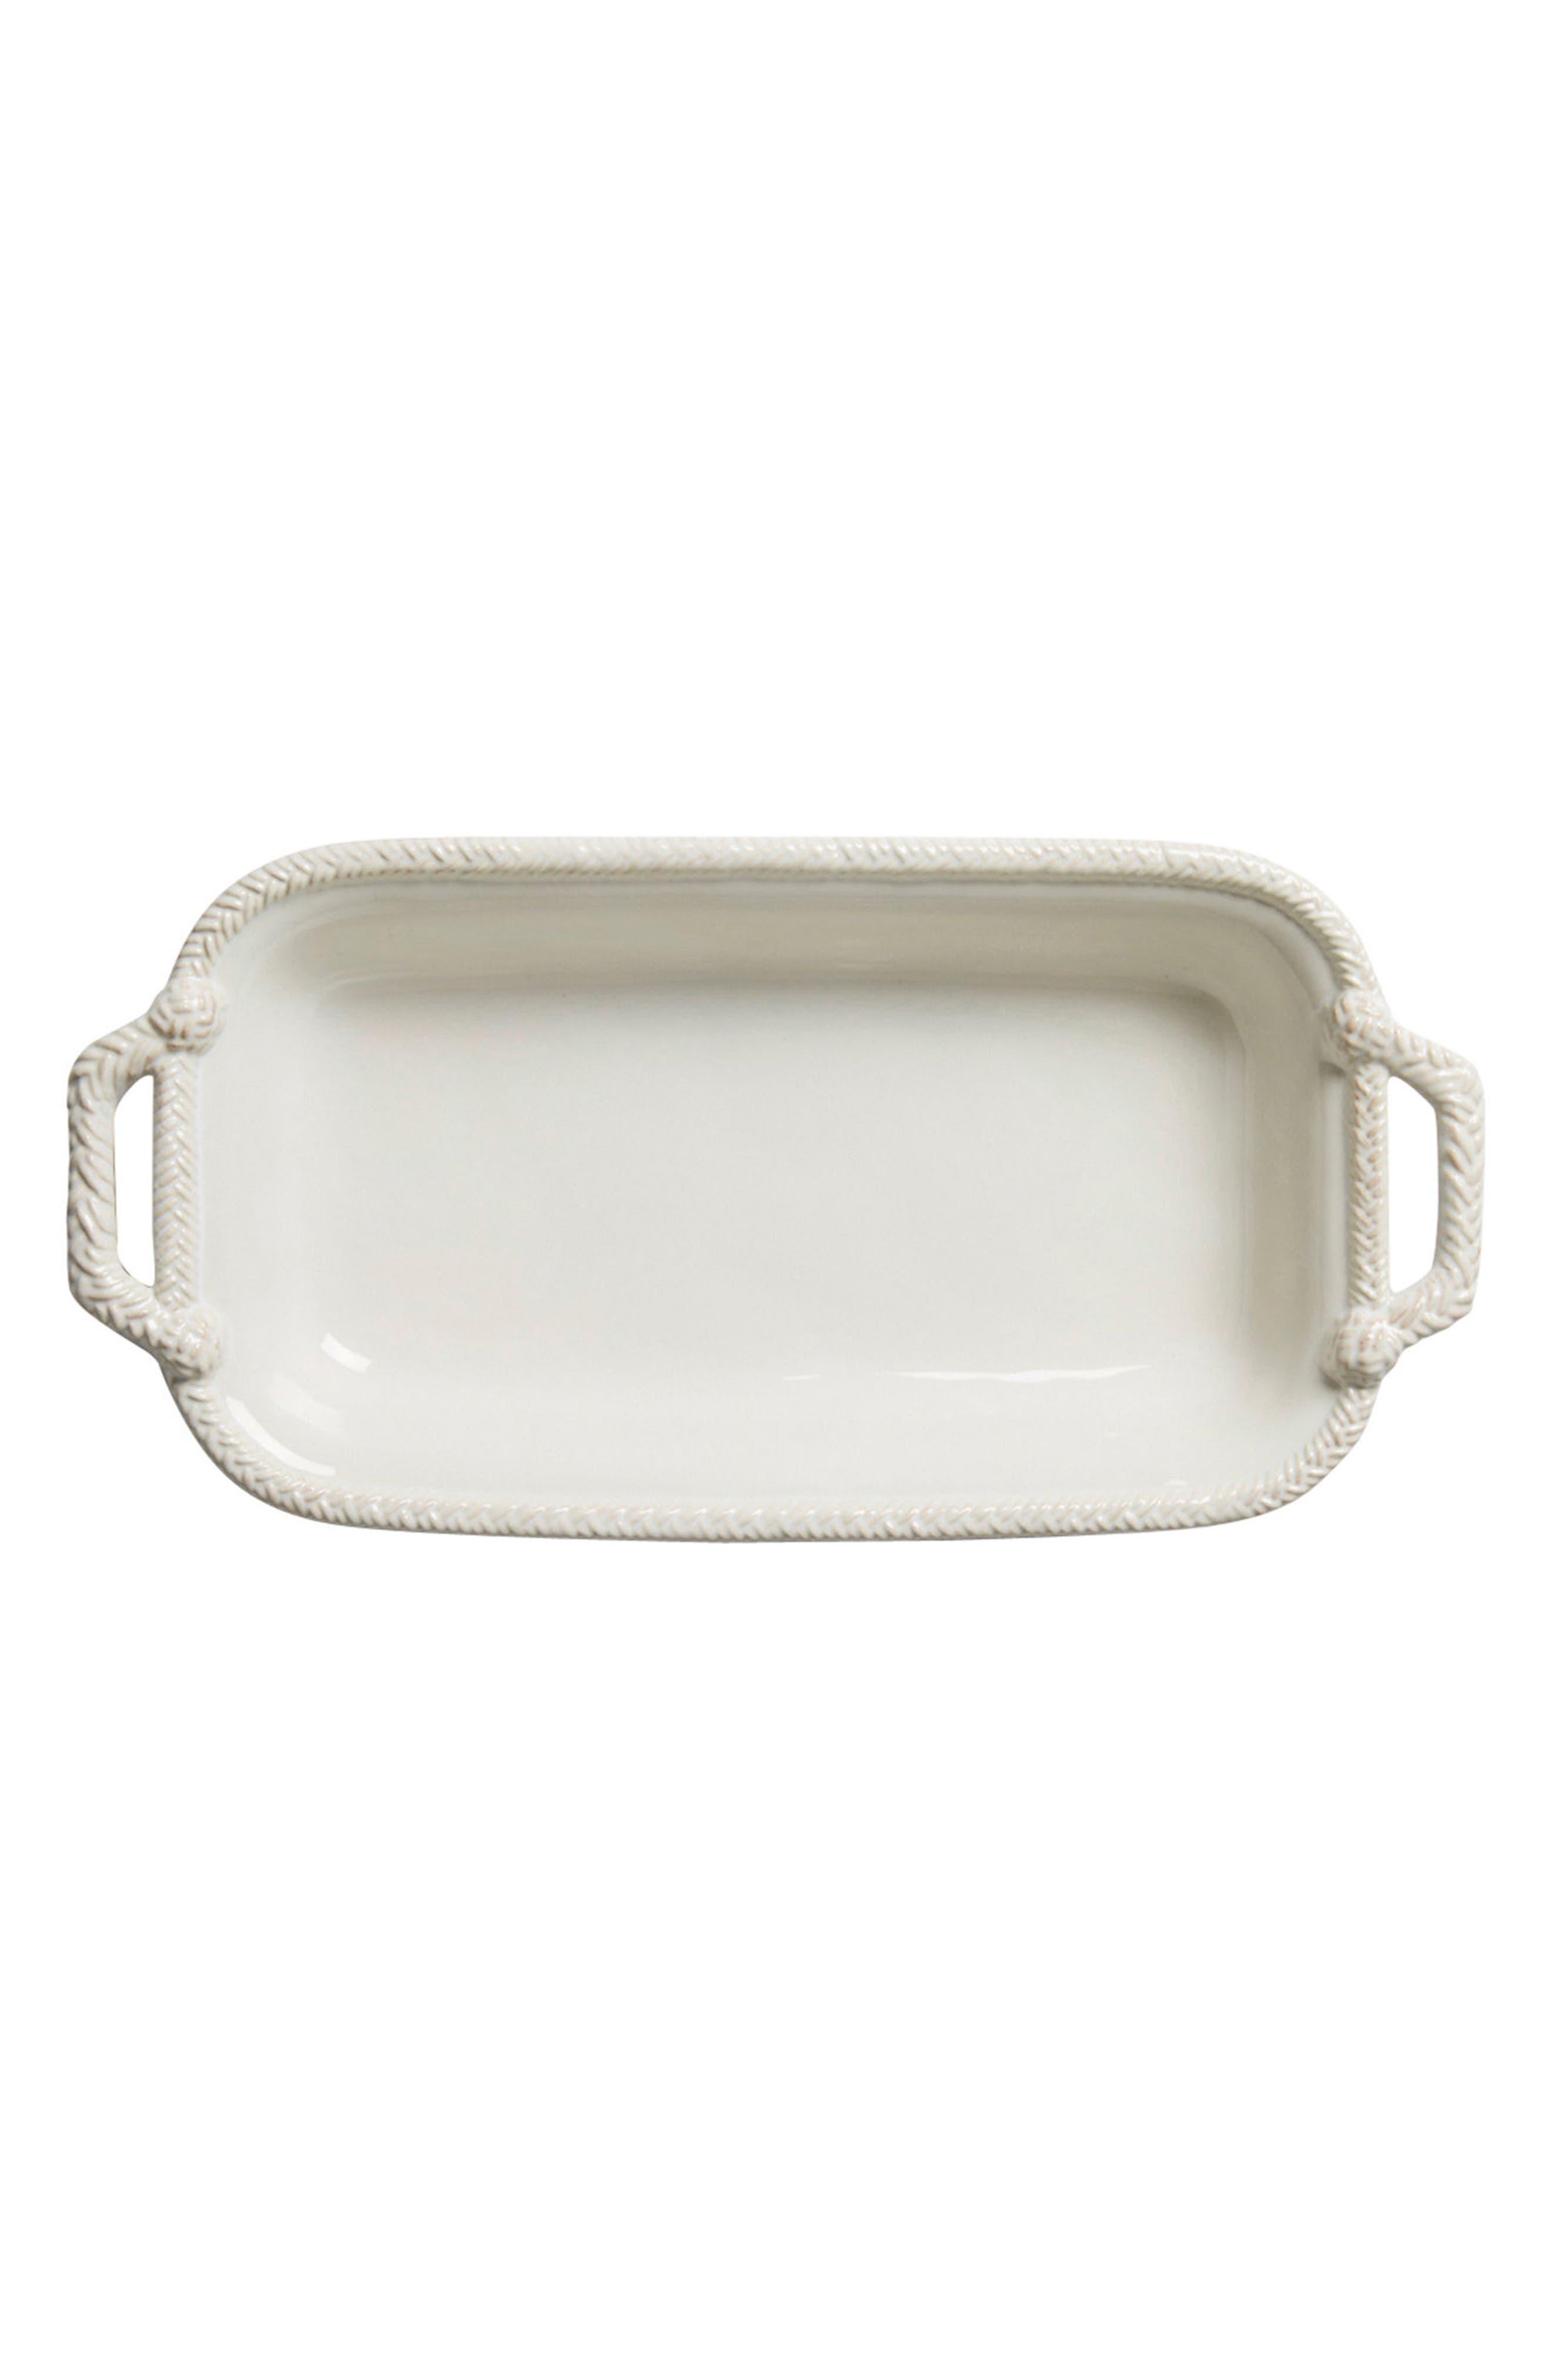 Alternate Image 1 Selected - Juliska Le Panier 1.5-Quart Rectangular Baking Dish